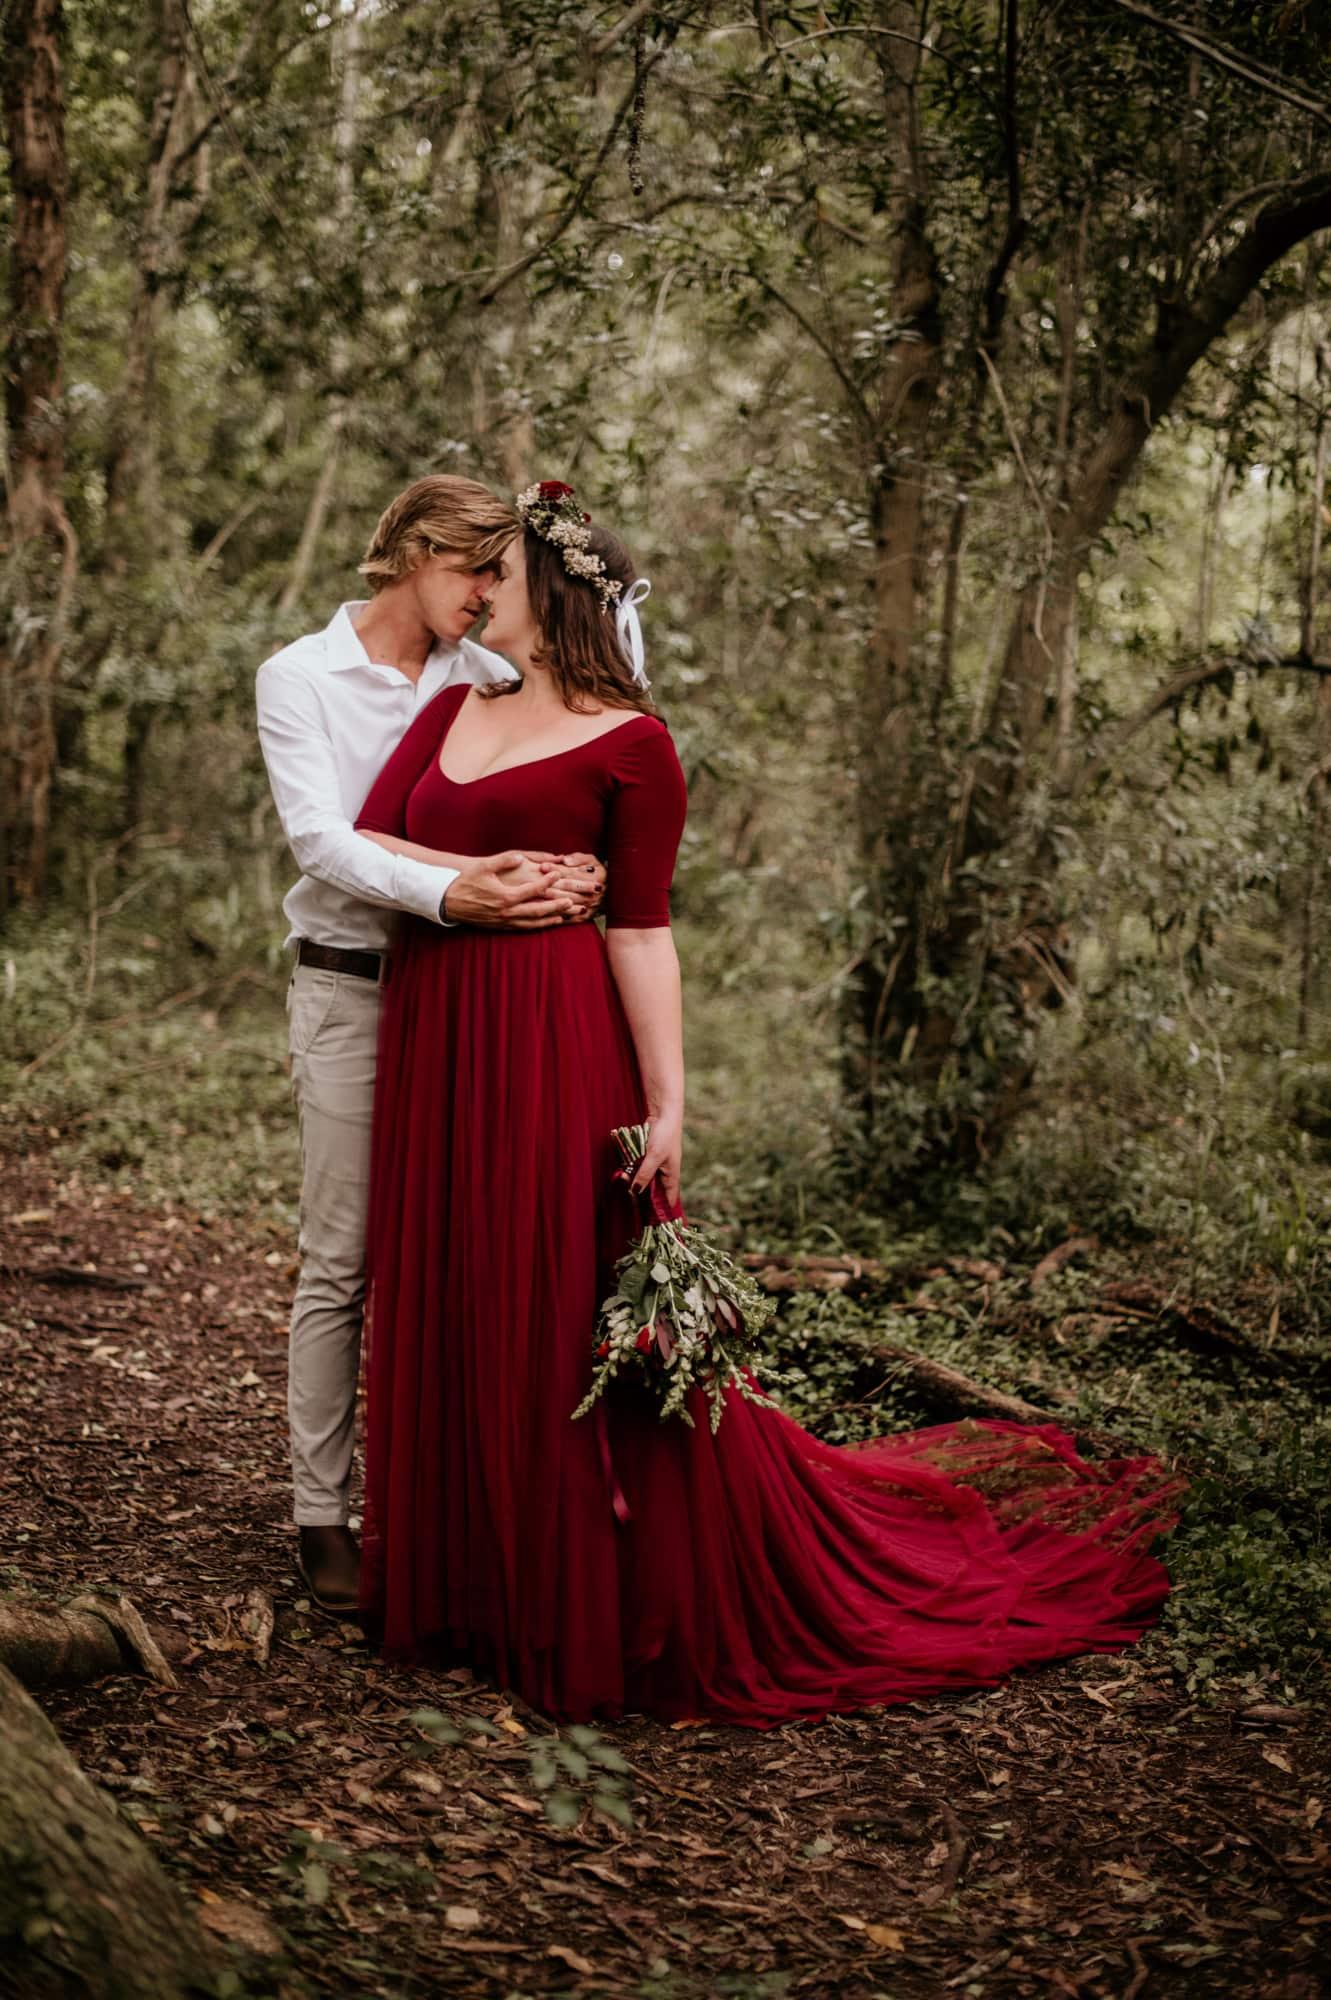 wesley-lanie-george-fernridge-engagement-June-Richards-Photography-Destination-Weddings-Elopements-Garden-Route-30